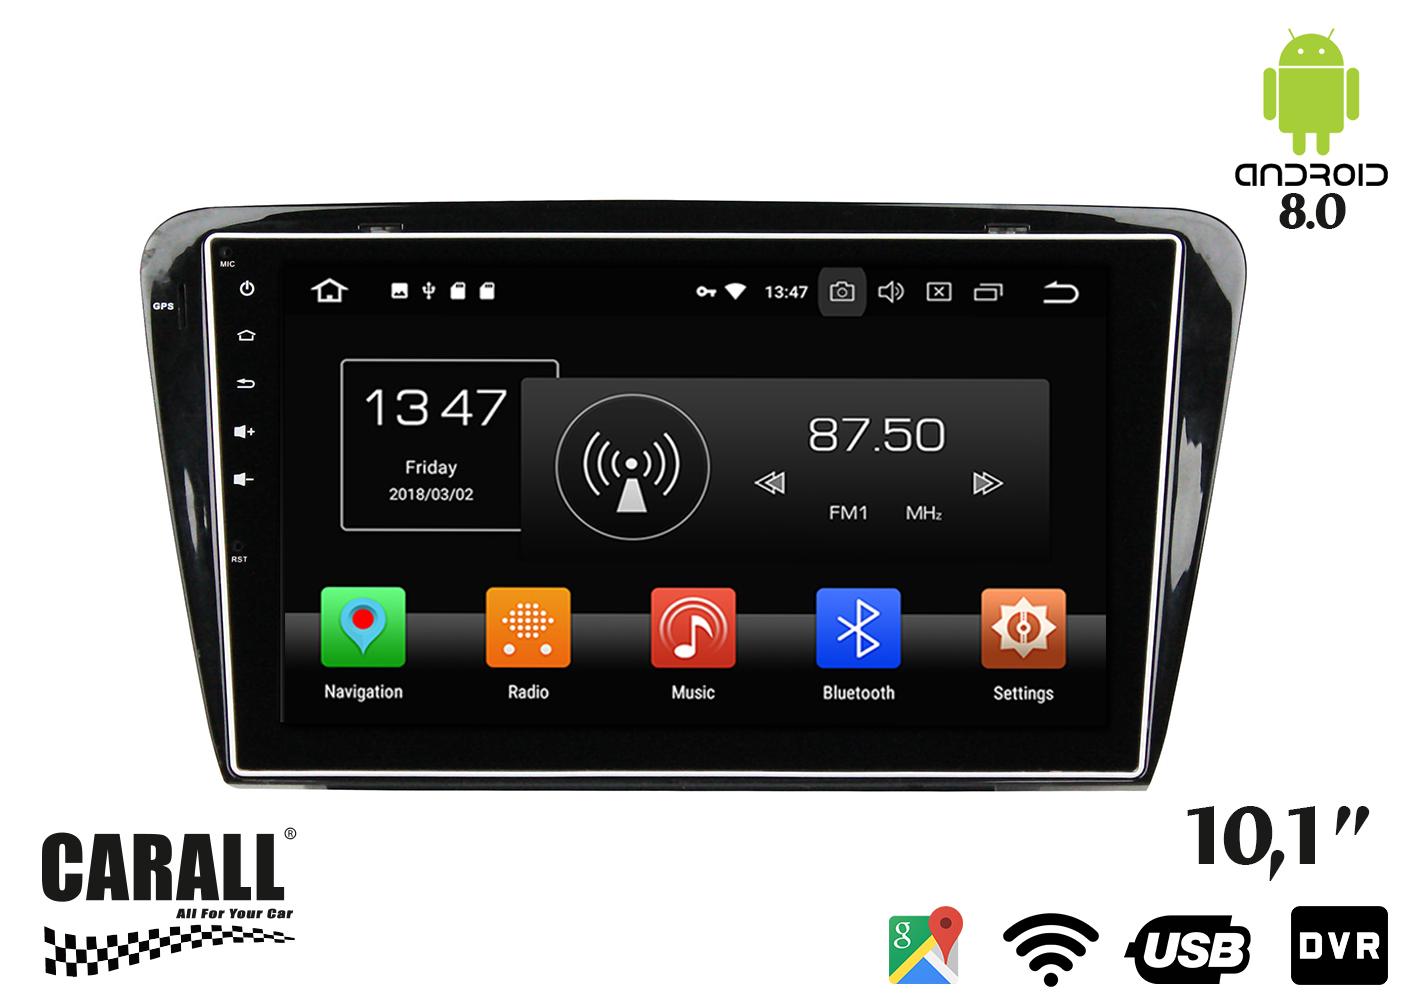 Autoradio Android 8,0 Skoda Octavia 2014 GPS DVD USB SD WI-FI Bluetooth Navigatore - KIT